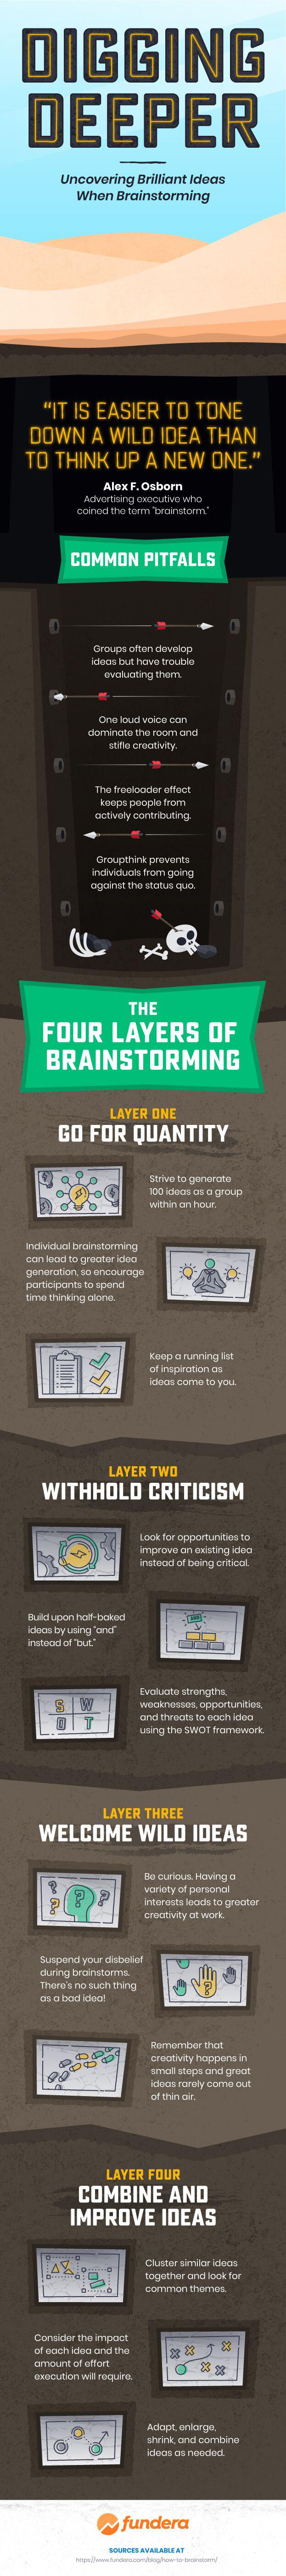 How To Brainstorm Brilliant Ideas [Infographic]